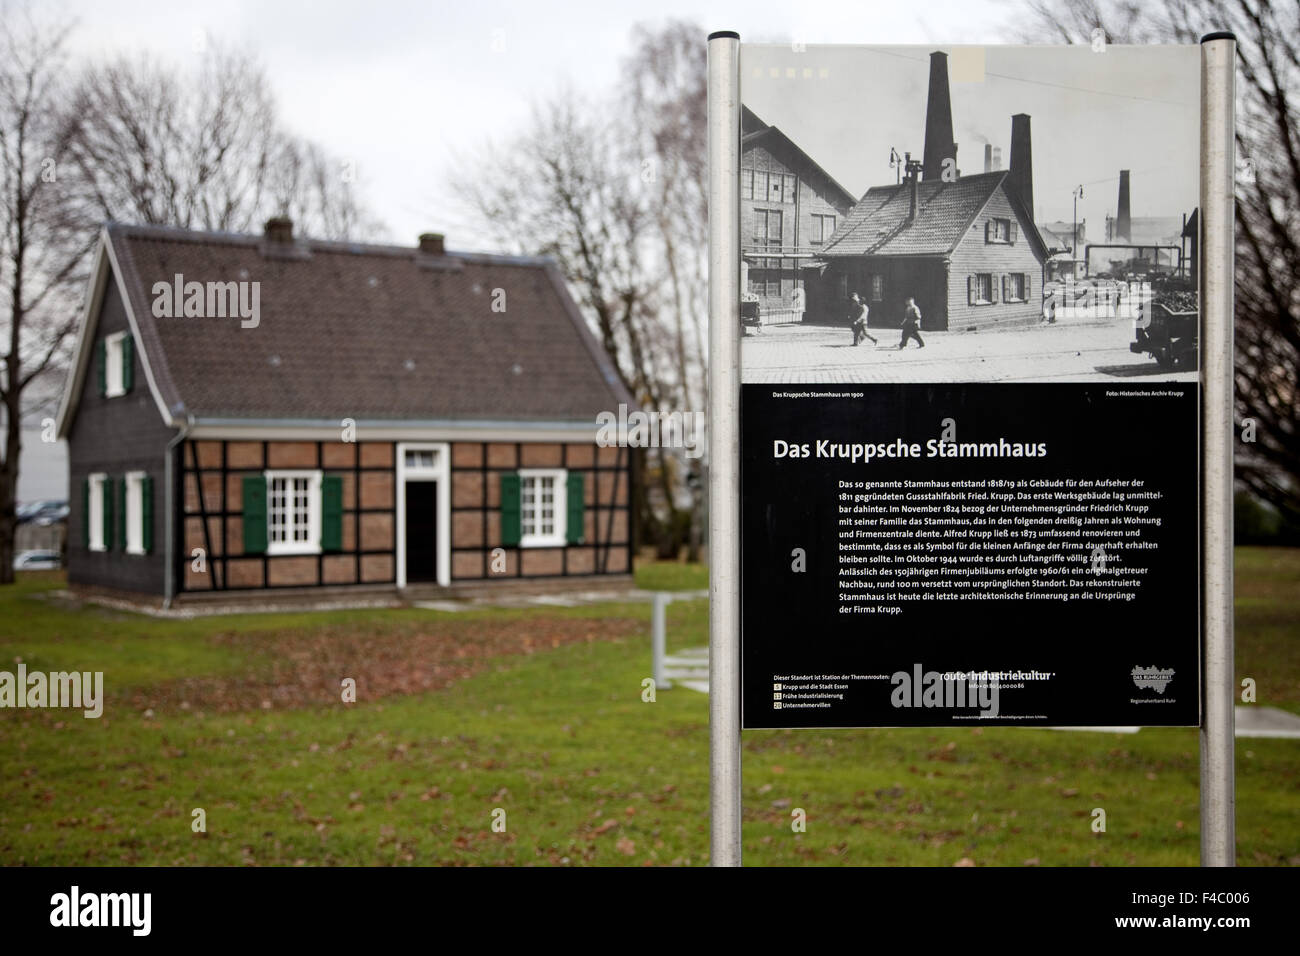 Krupp Stammhaus, Essen, Germany - Stock Image